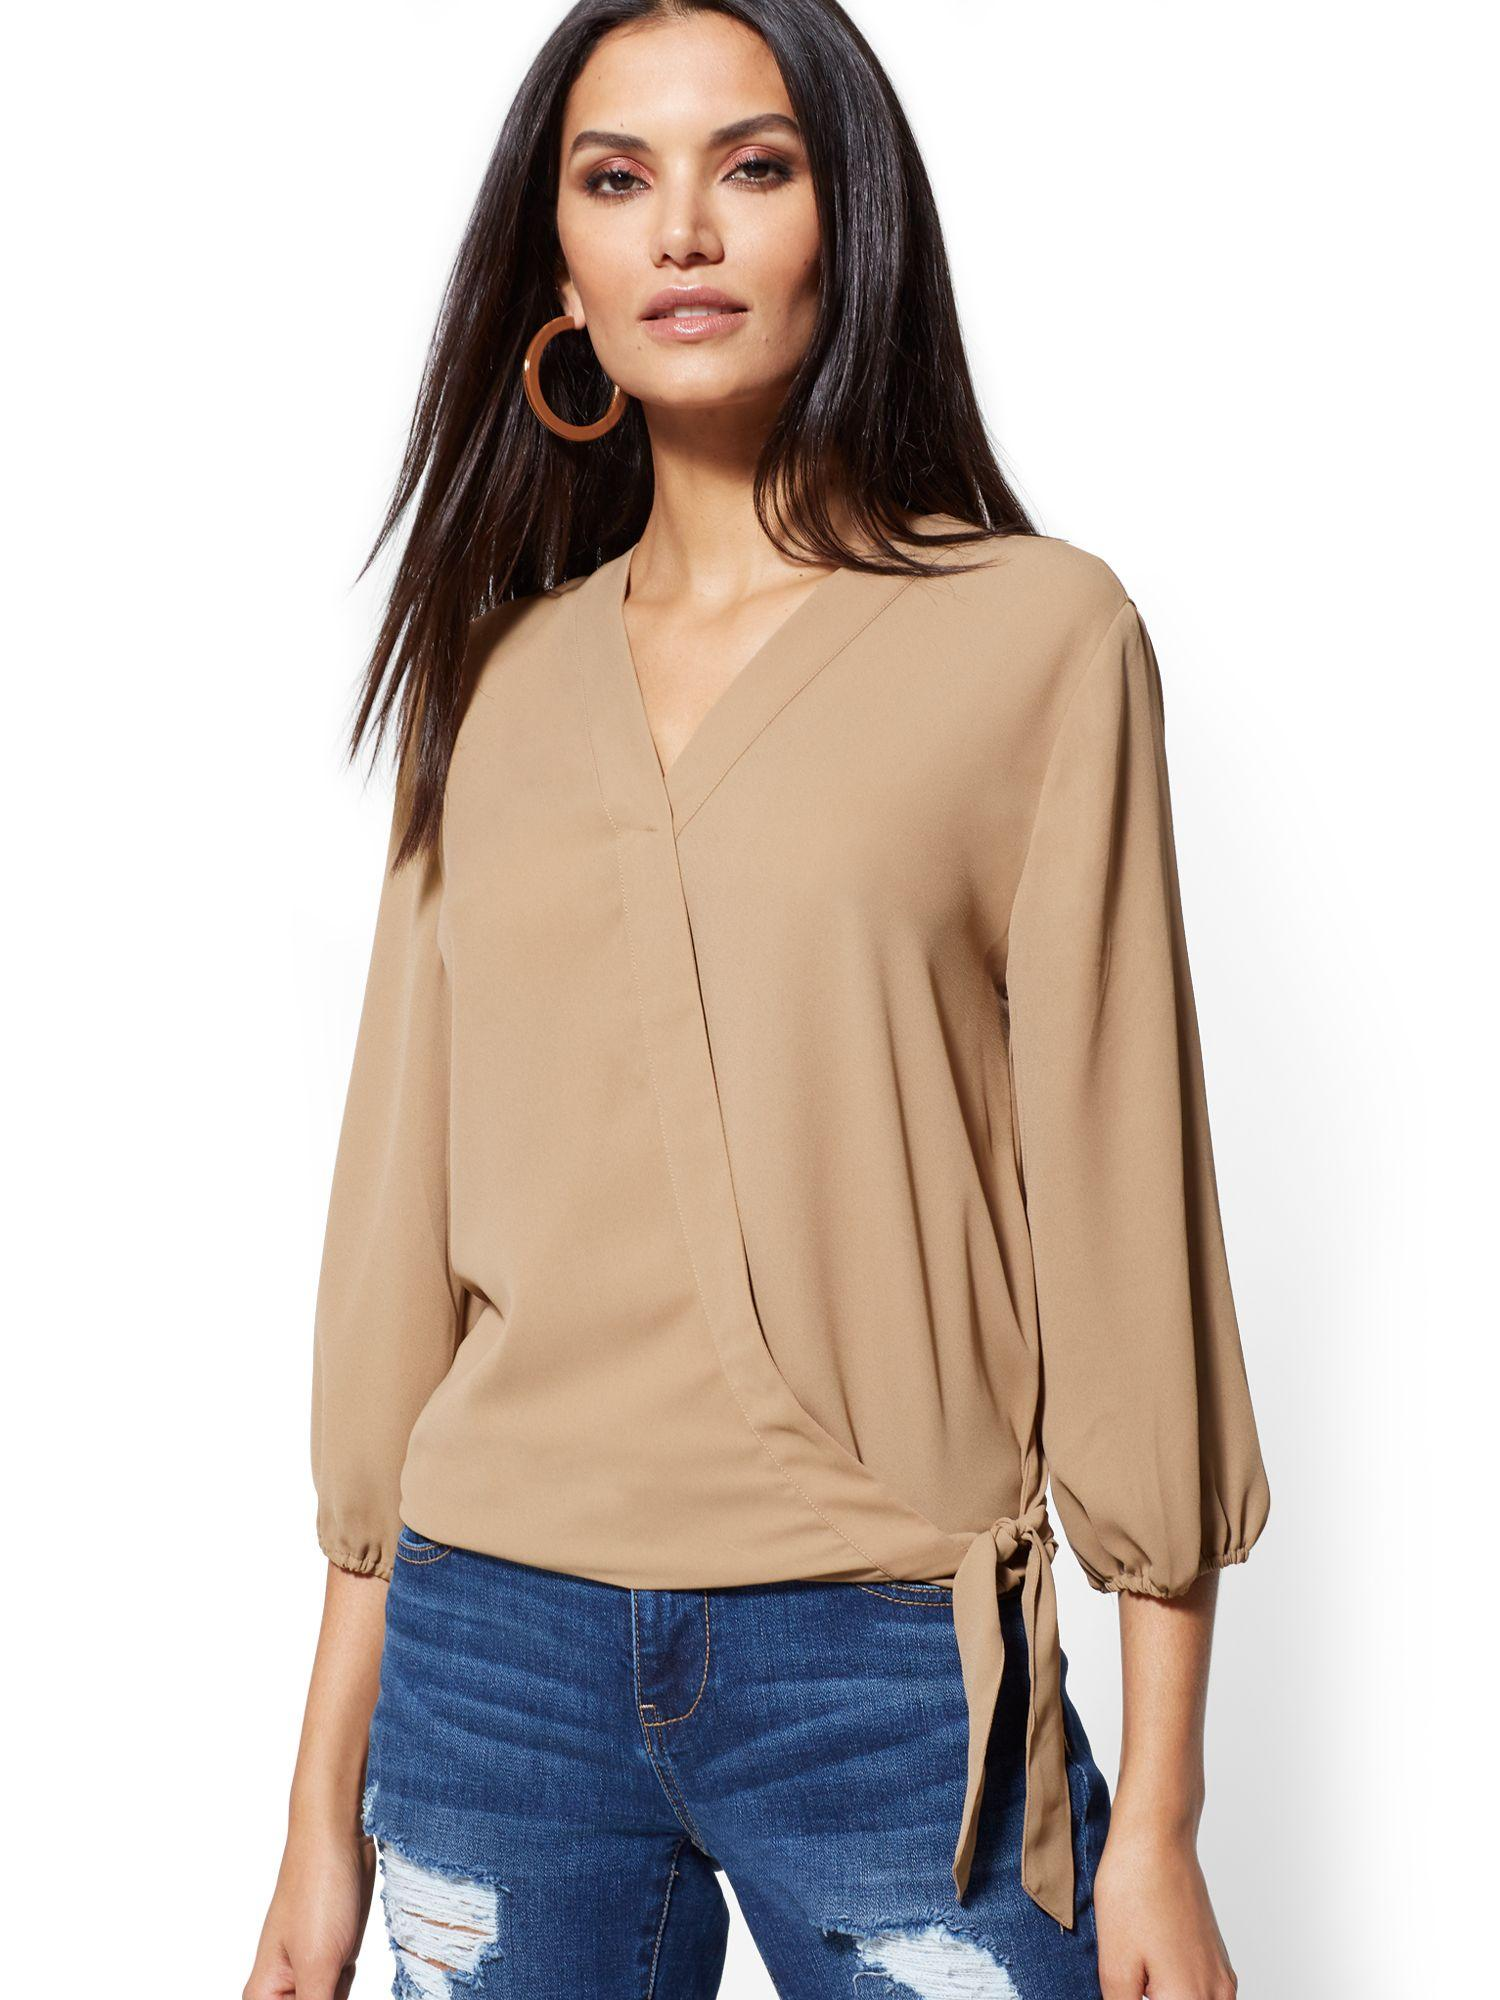 d6906741c5b New York   Company. Women s Natural Tie-front Wrap Blouse - Soho Soft Shirt